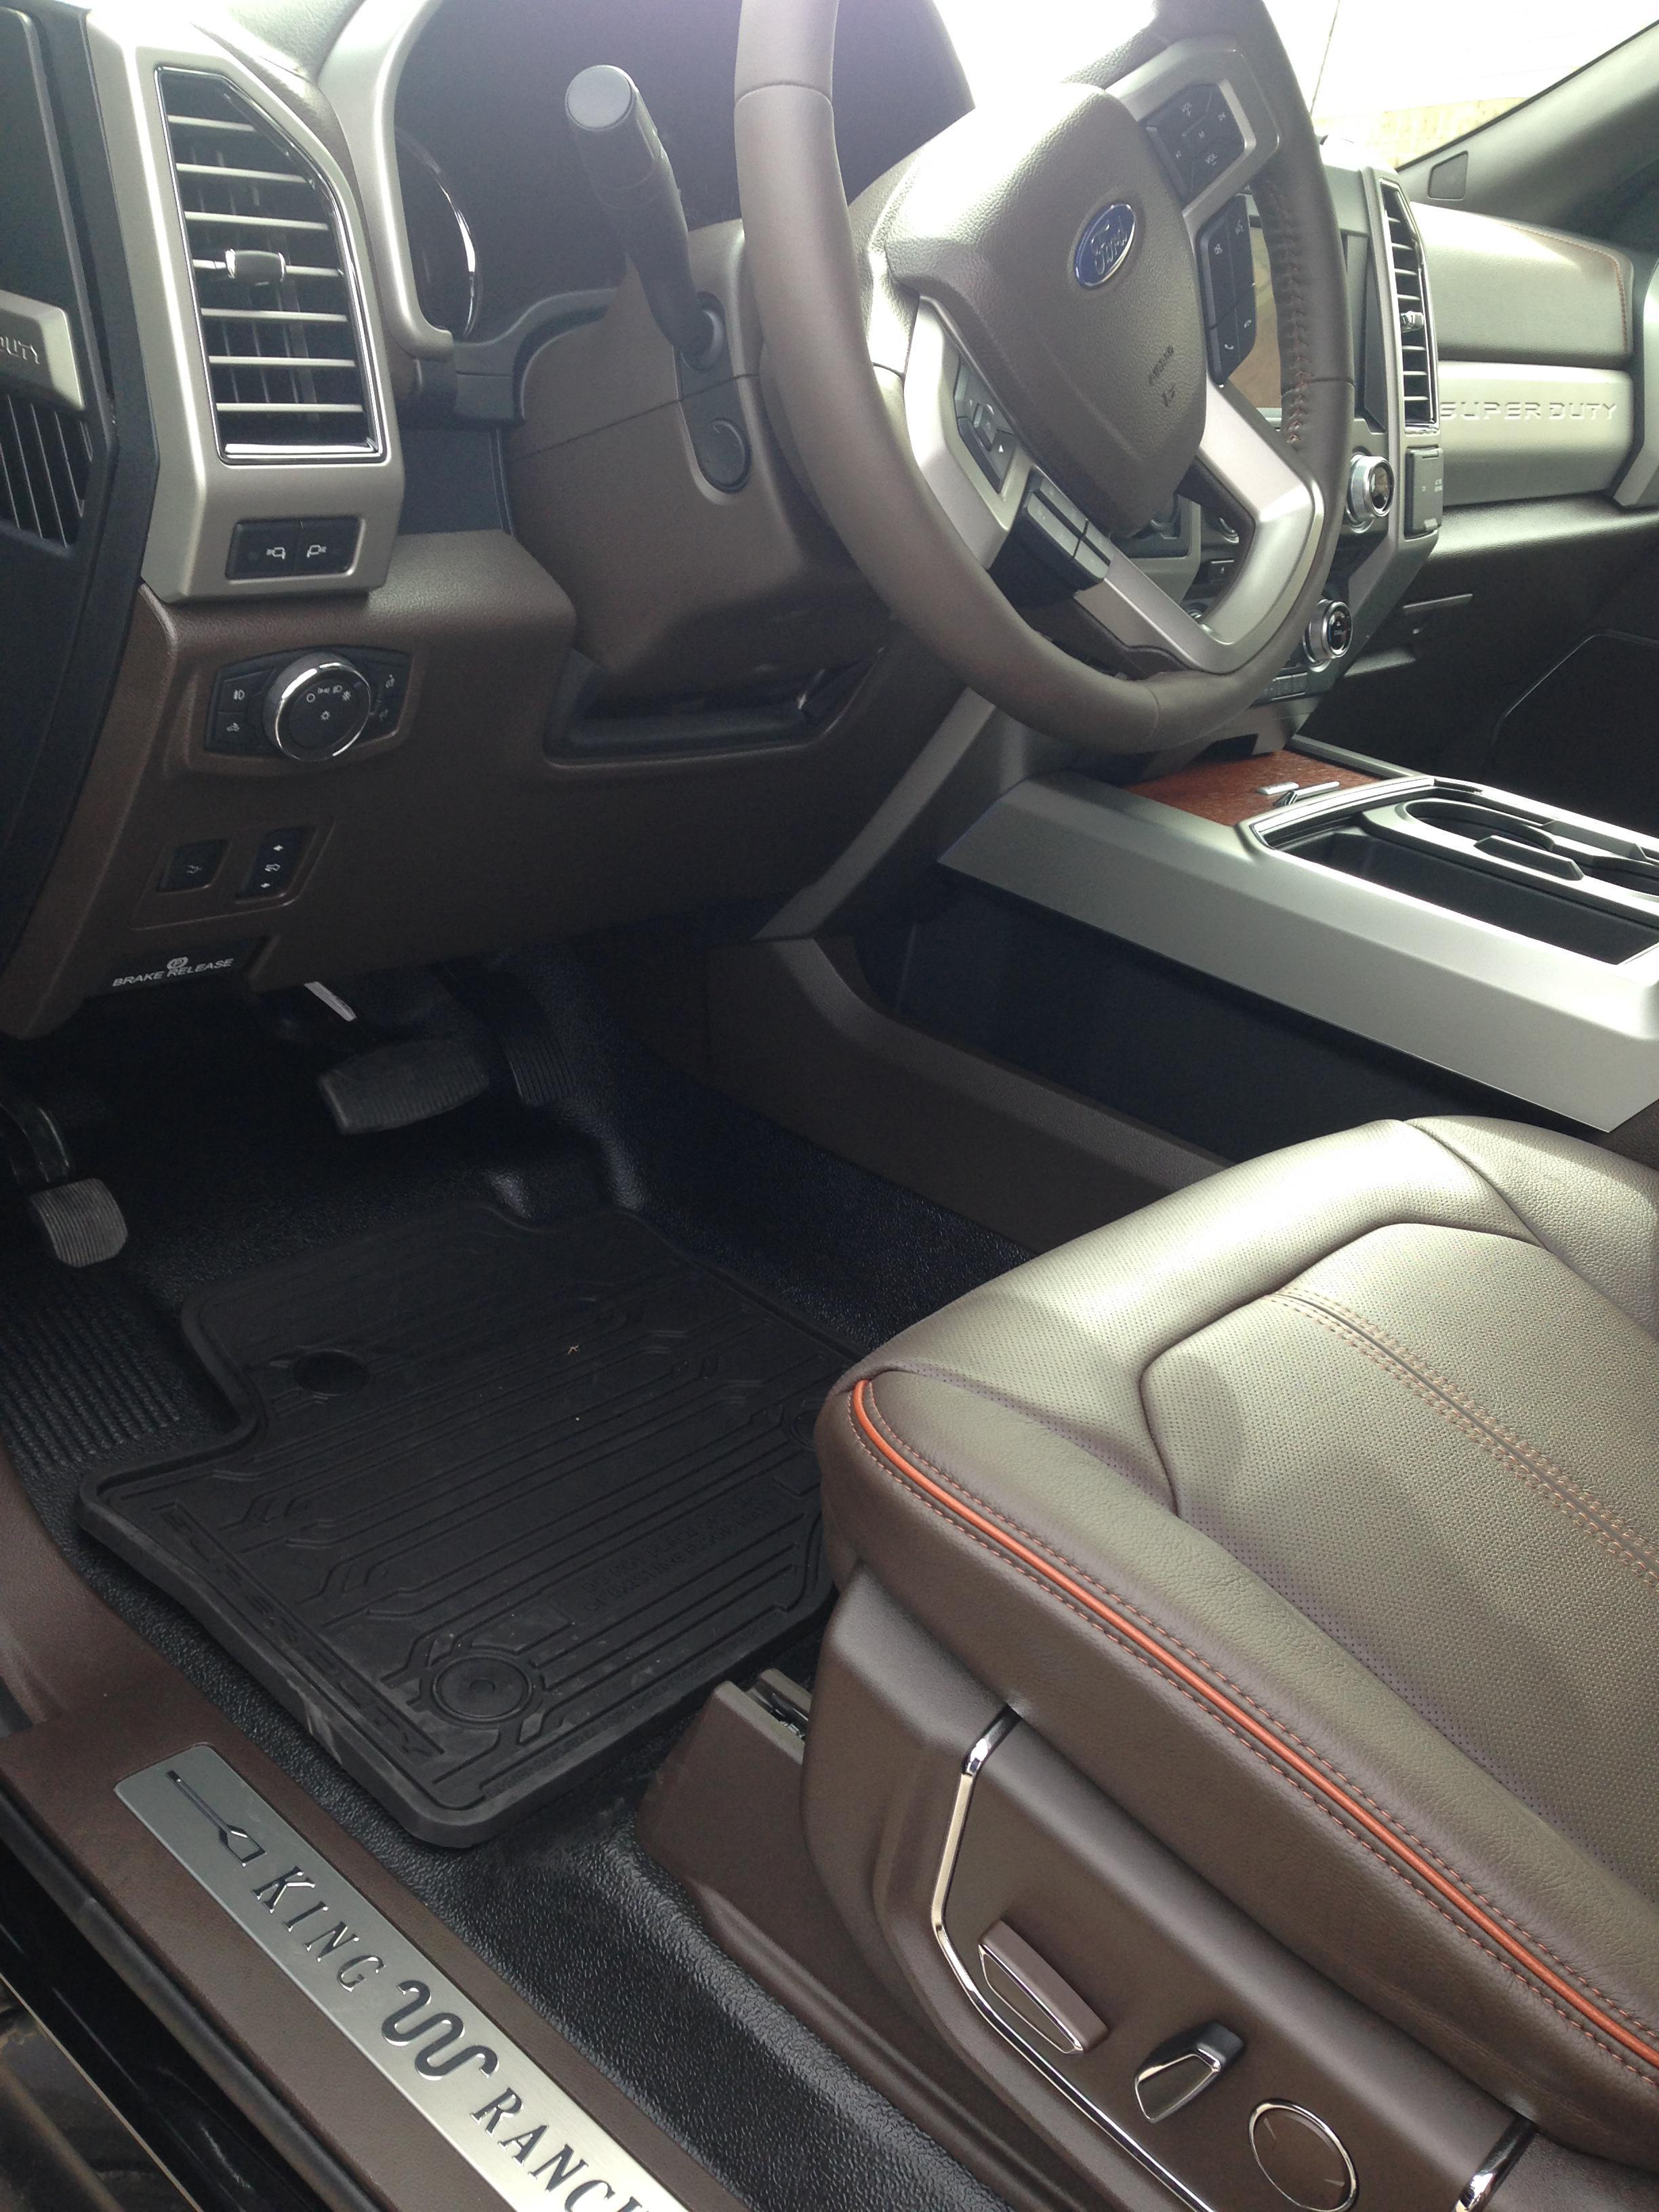 king ranch wvinyl floors  floor mats ford powerstroke diesel forum